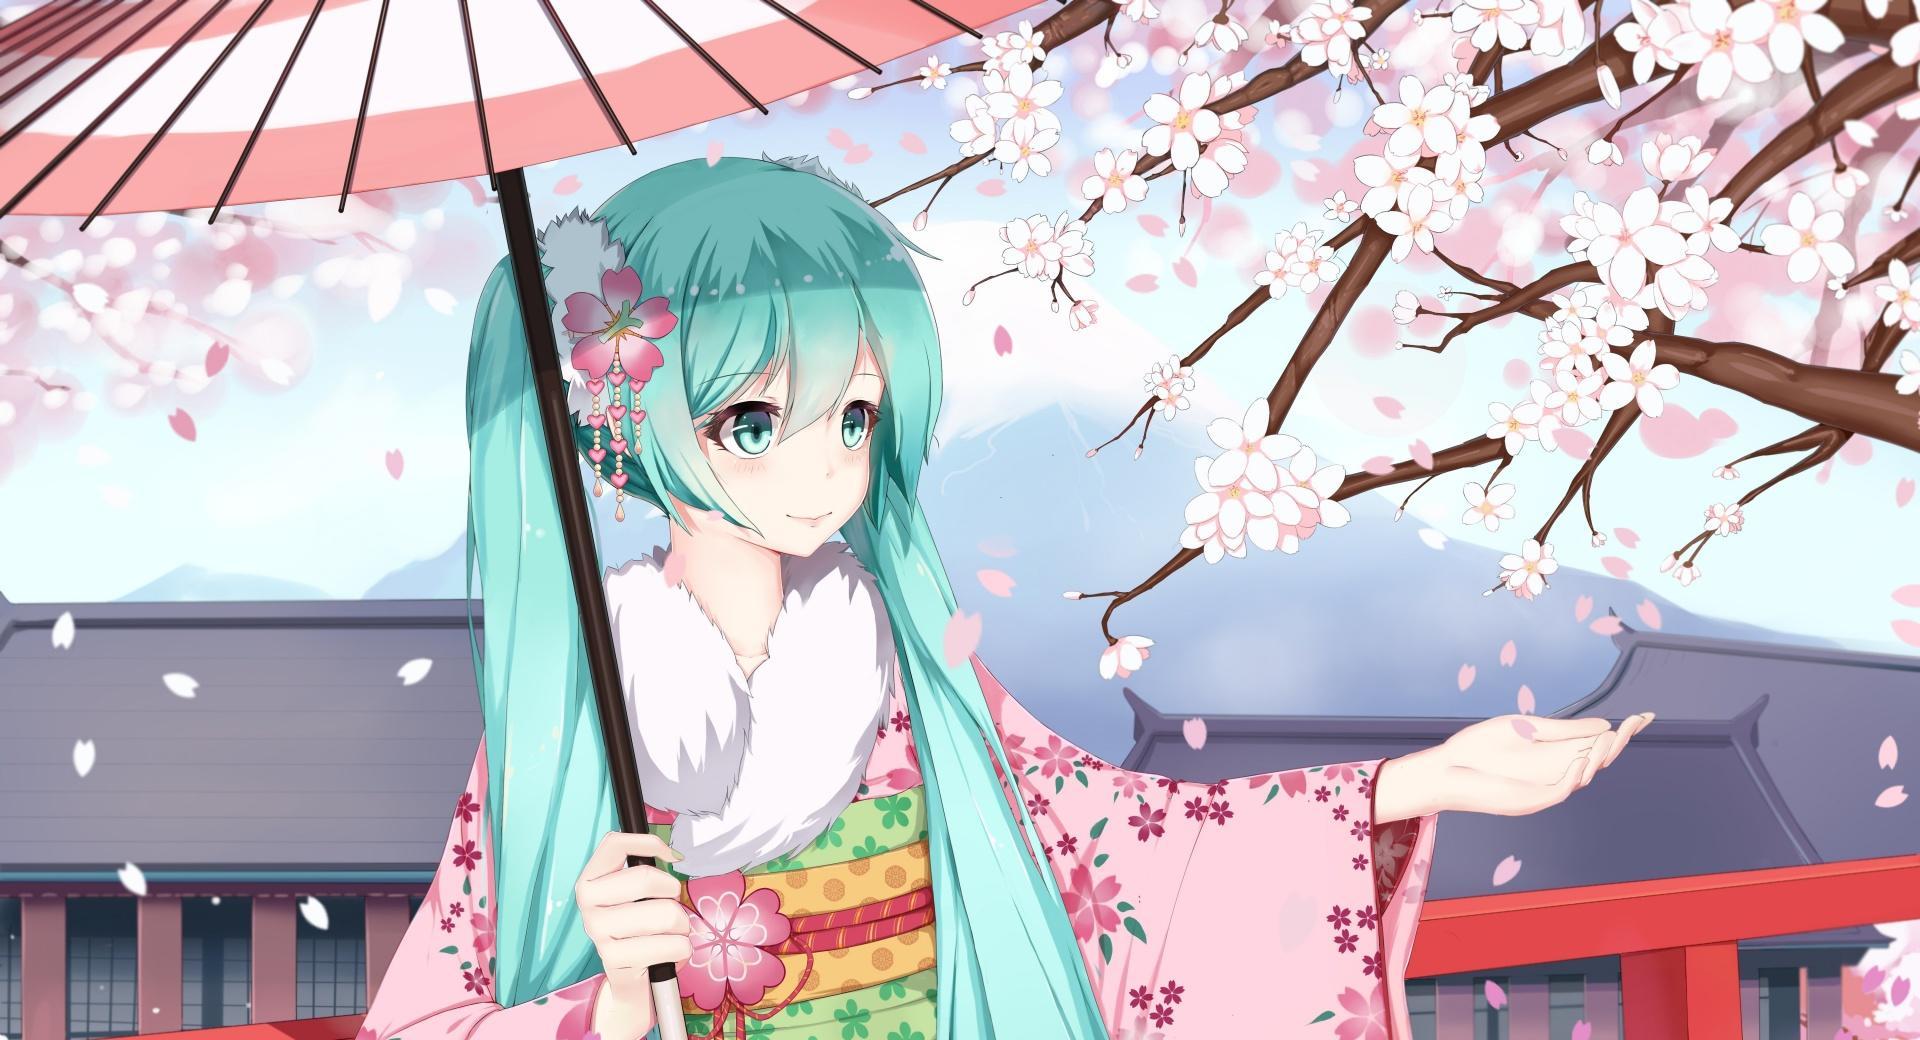 Hatsune Miku Sakura wallpapers HD quality